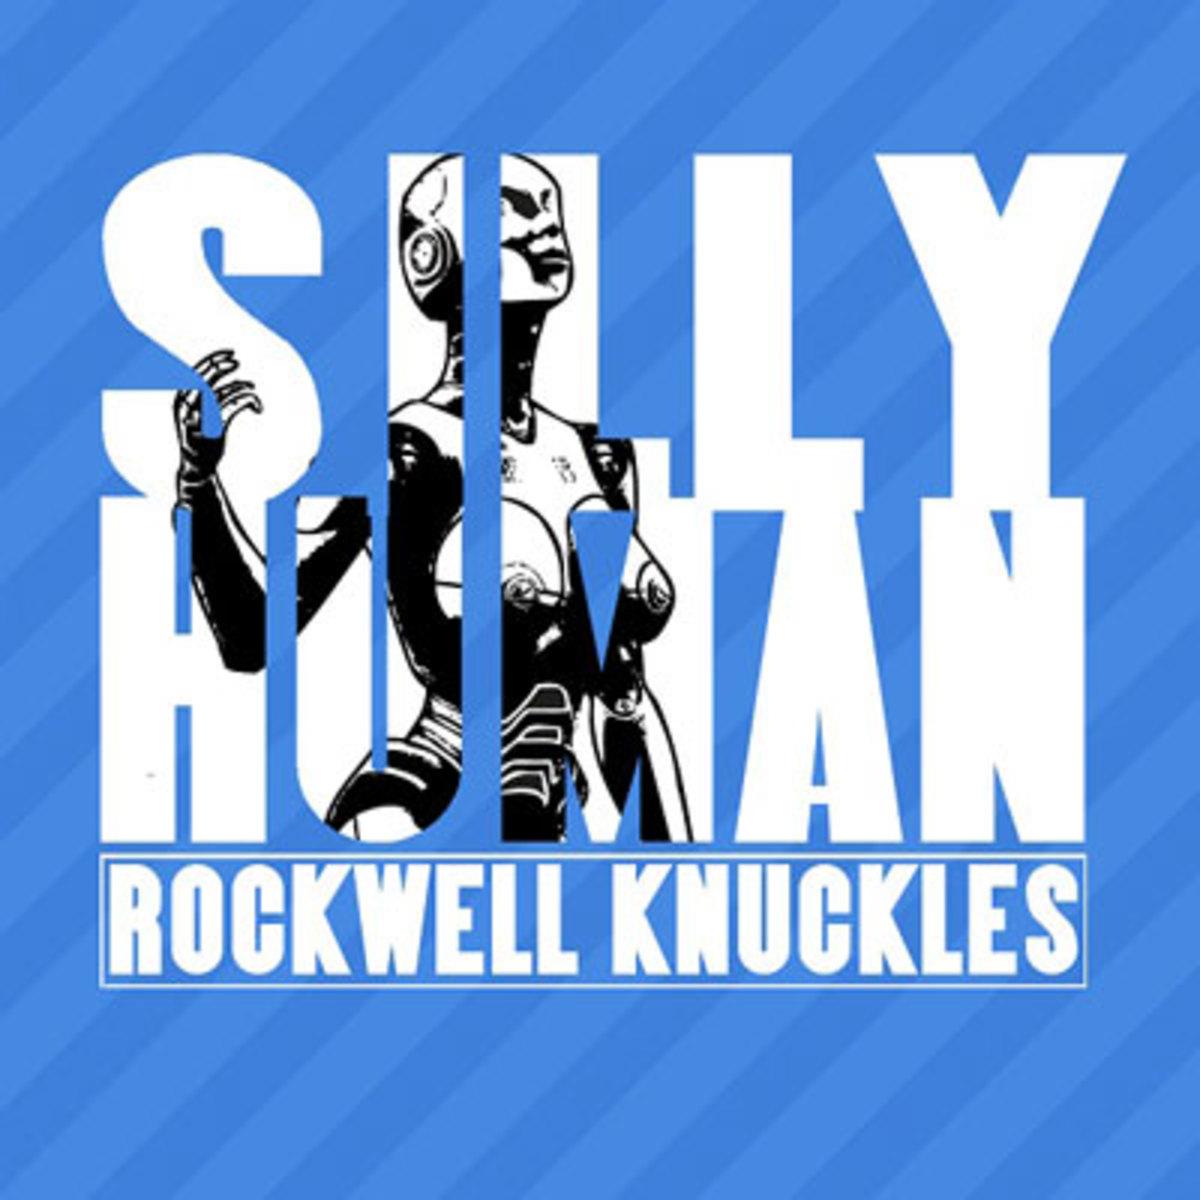 rockwellknuckles-sillyhuman.jpg